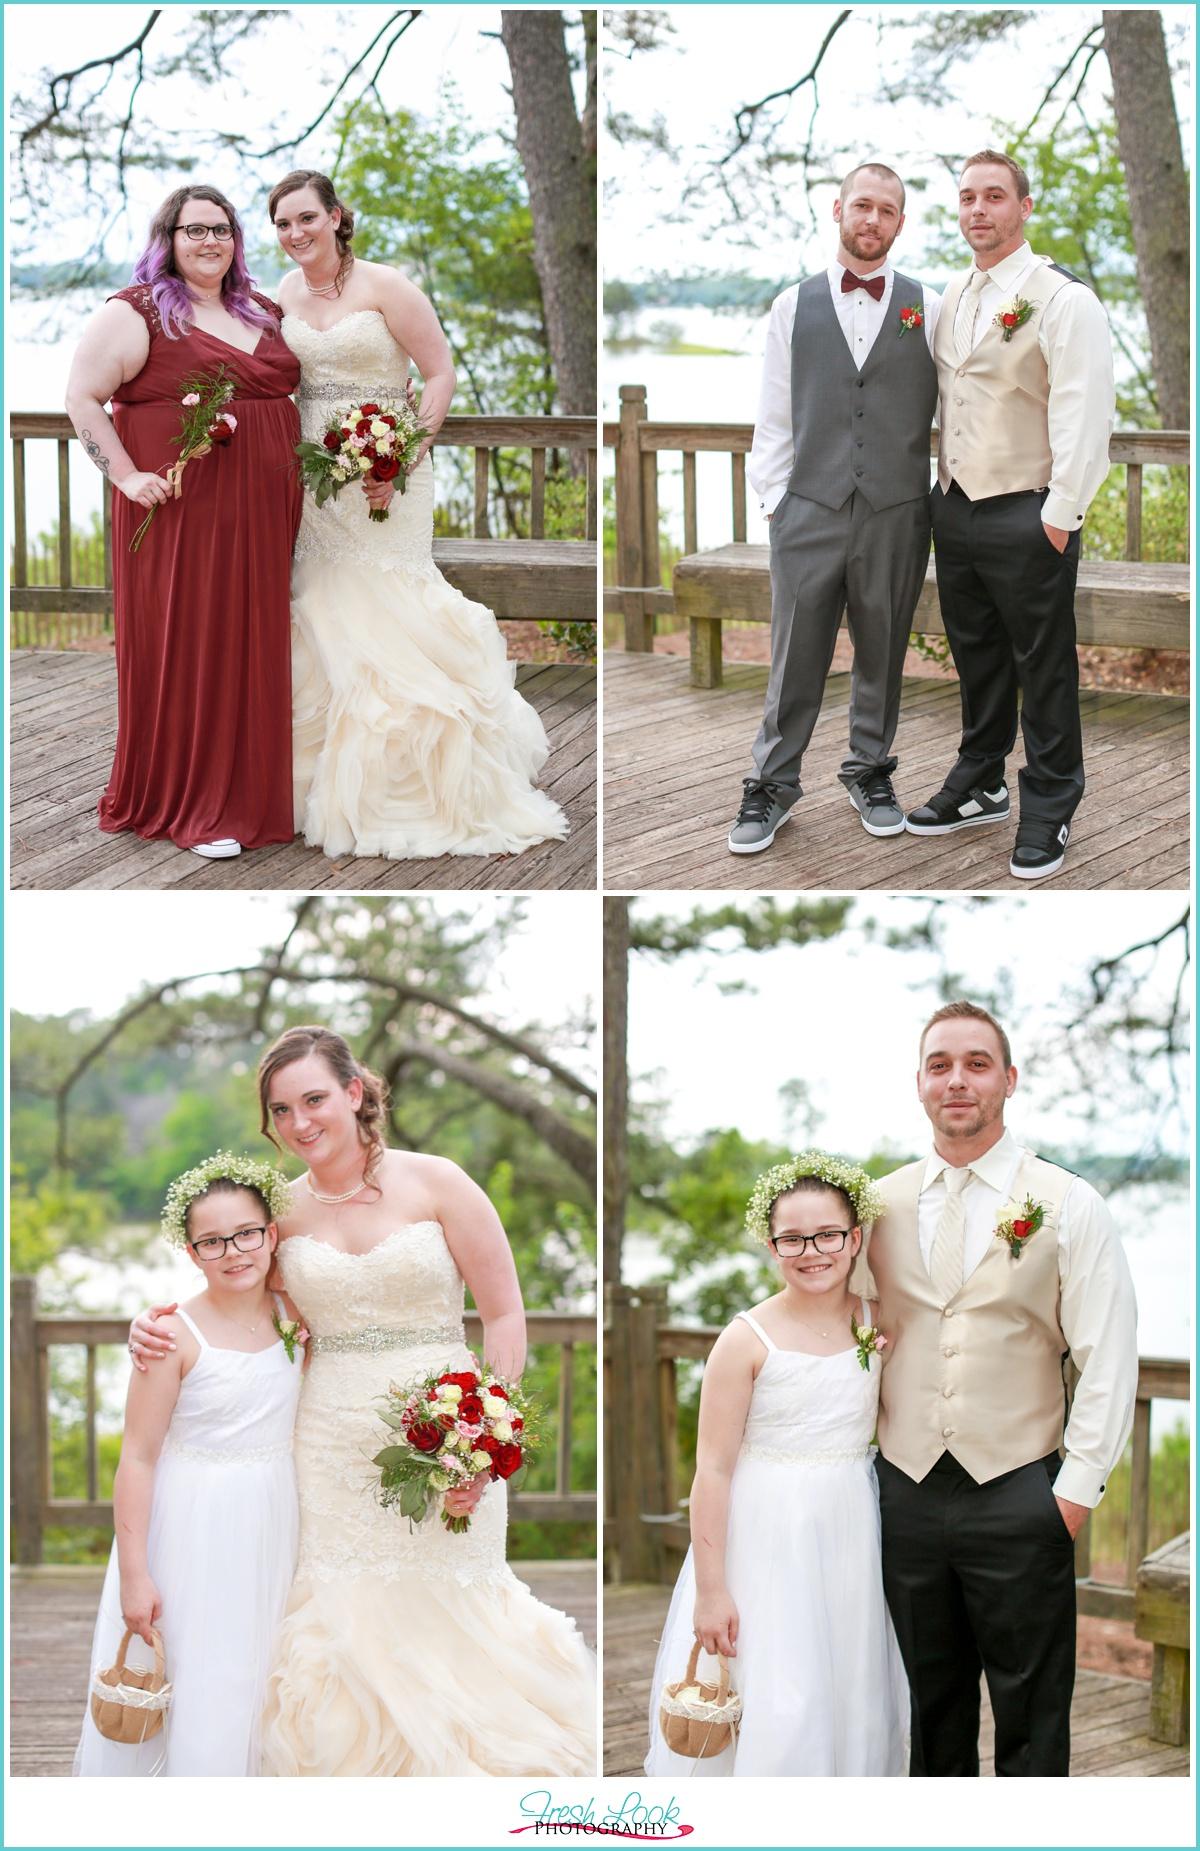 Virginia Beach bridal party